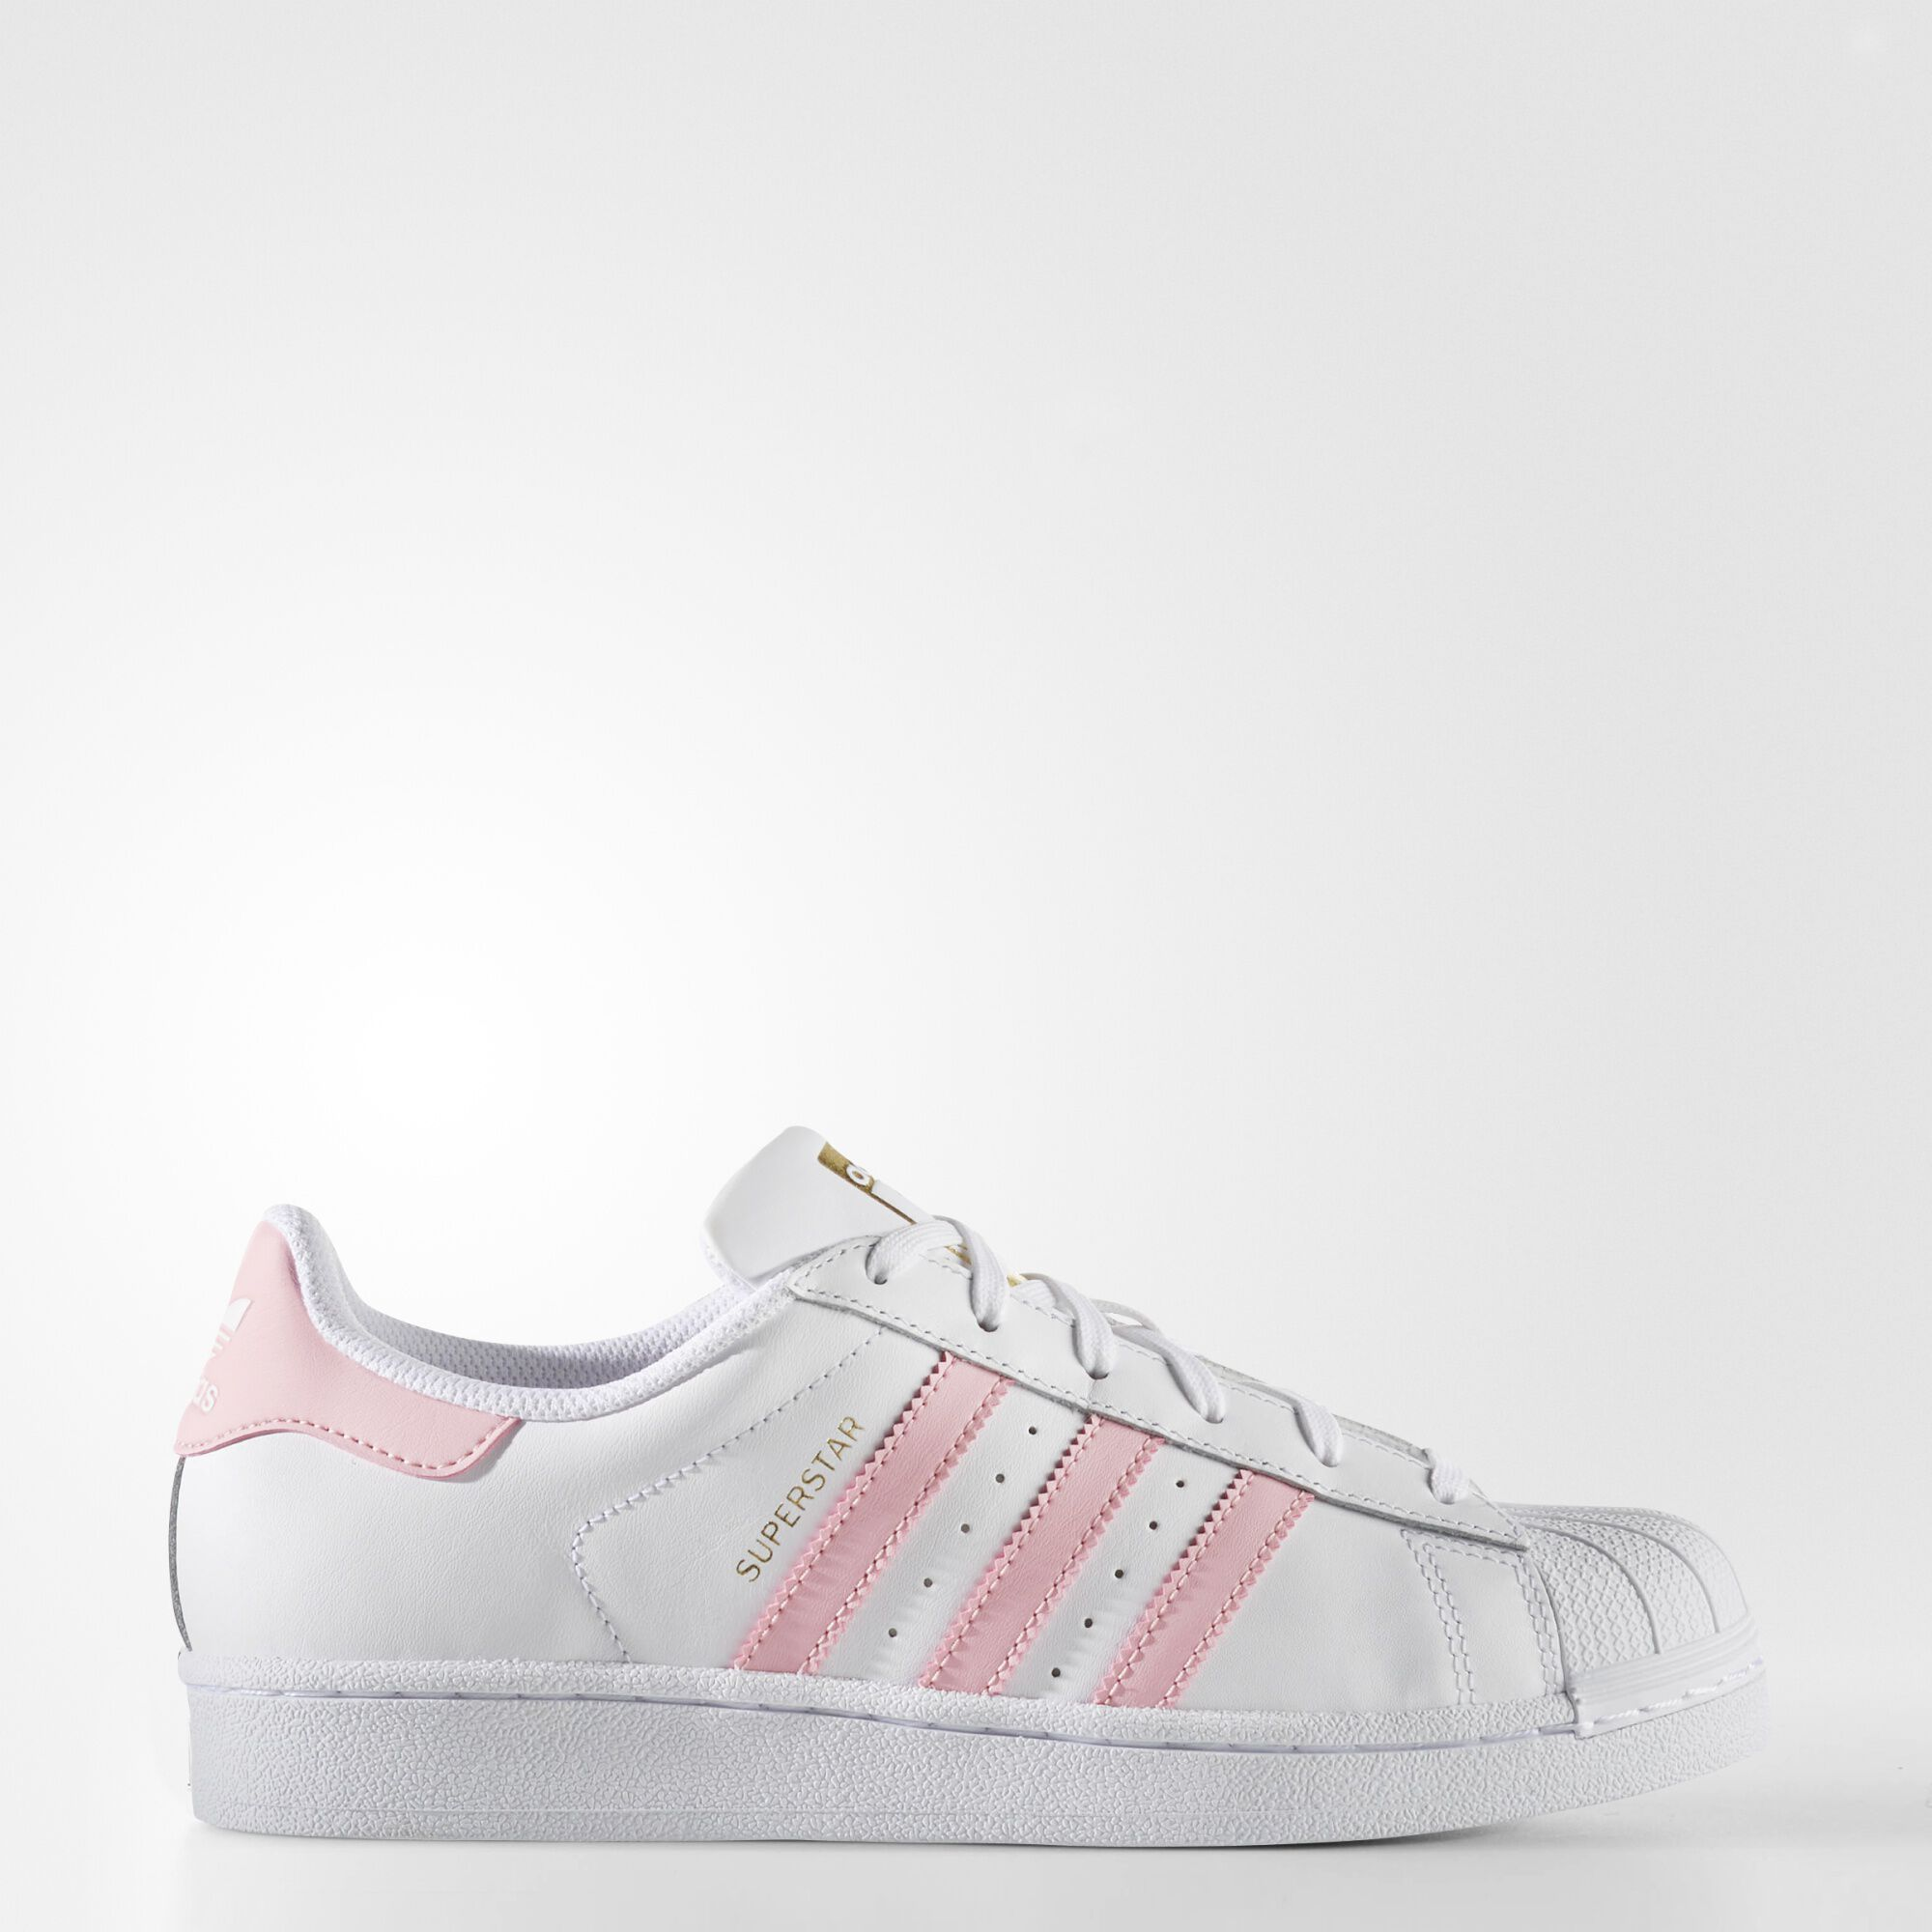 Cheap Superstar Adicolor, Cheapest Adidsas Superstar Adicolor Shoes Sale 2017